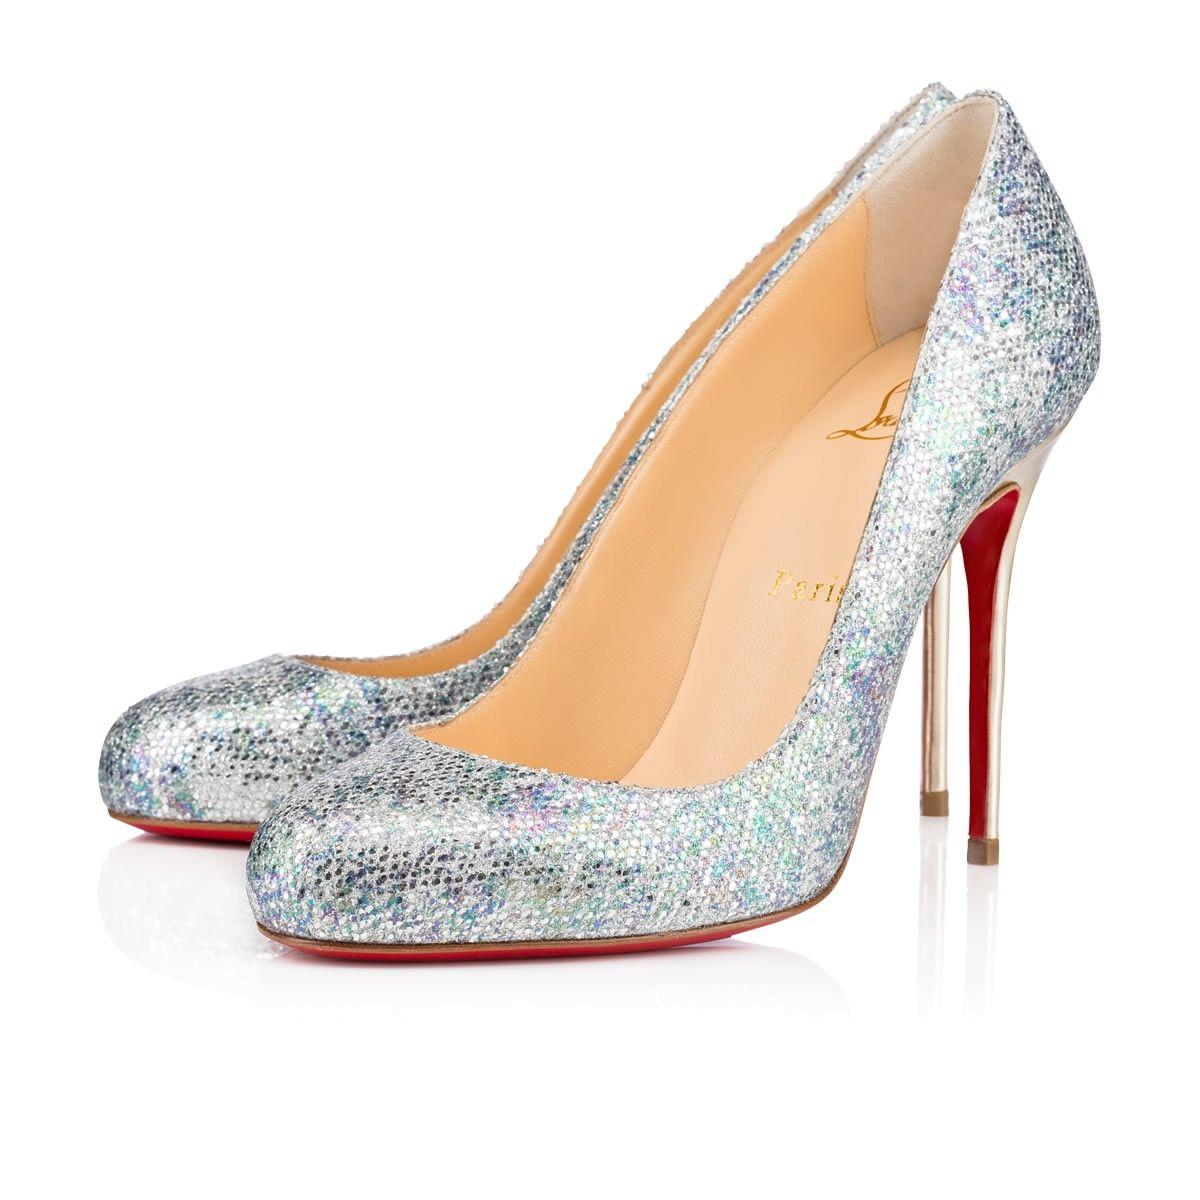 info for c151d ce41f CHRISTIAN LOUBOUTIN Fifi Glitter - Bridal - Shoes - Women ...